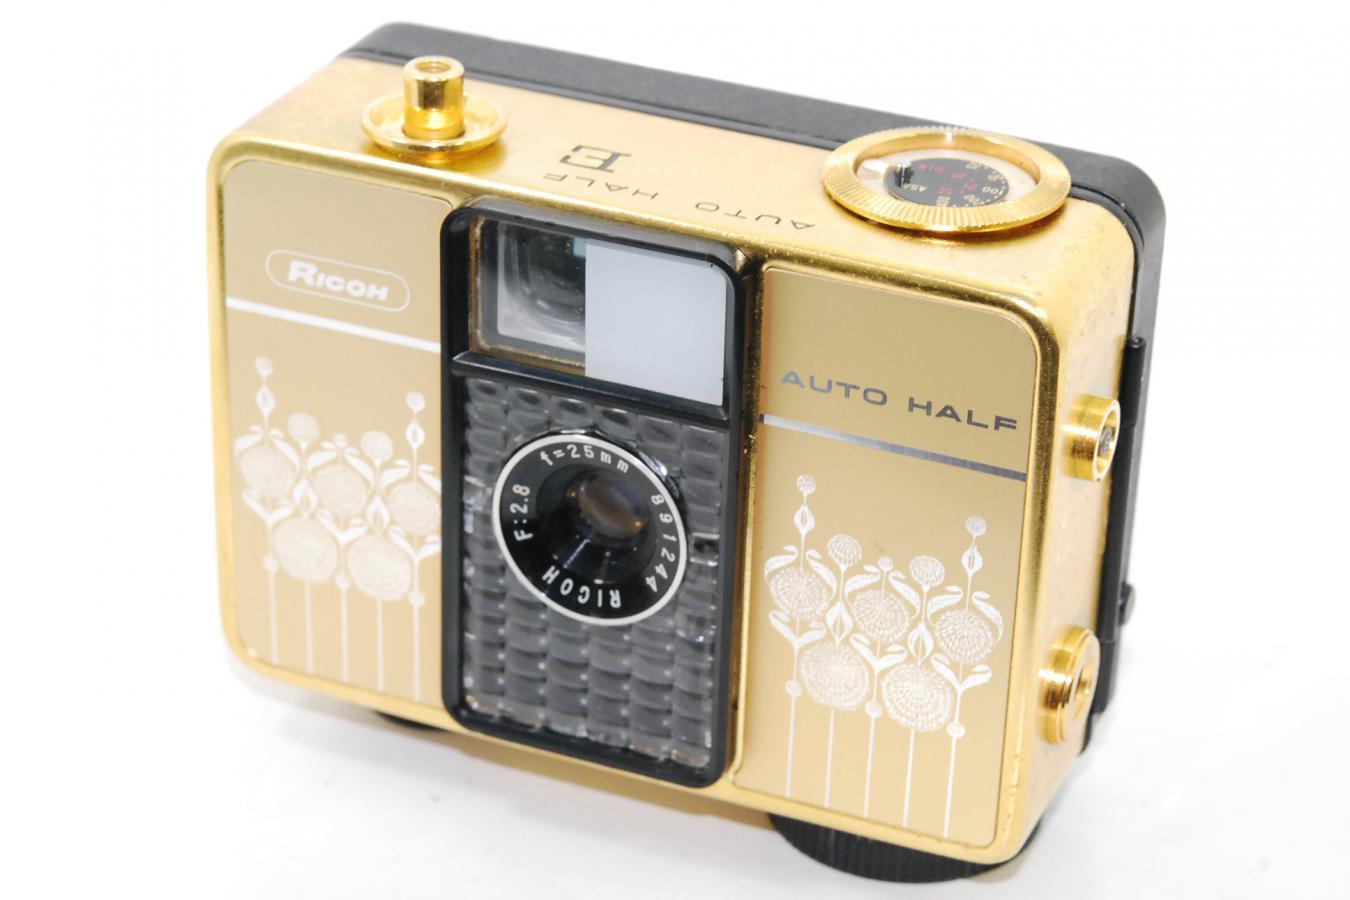 RICOH AUTO HALF E Gold 【RICOH 25/2.8レンズ搭載】